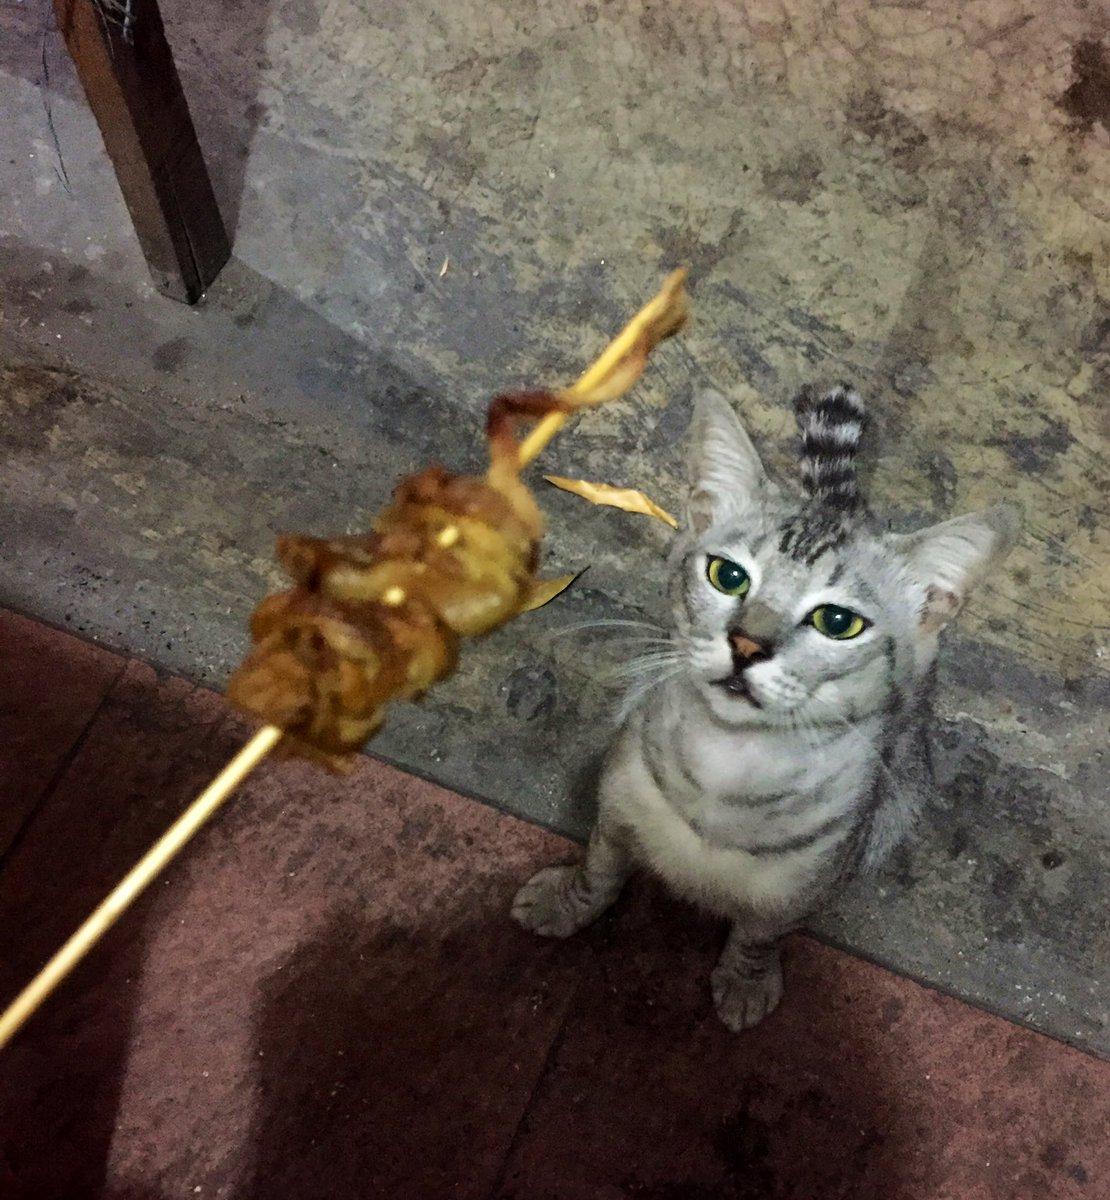 Download 95+  Gambar Kucing Bengong Paling Imut